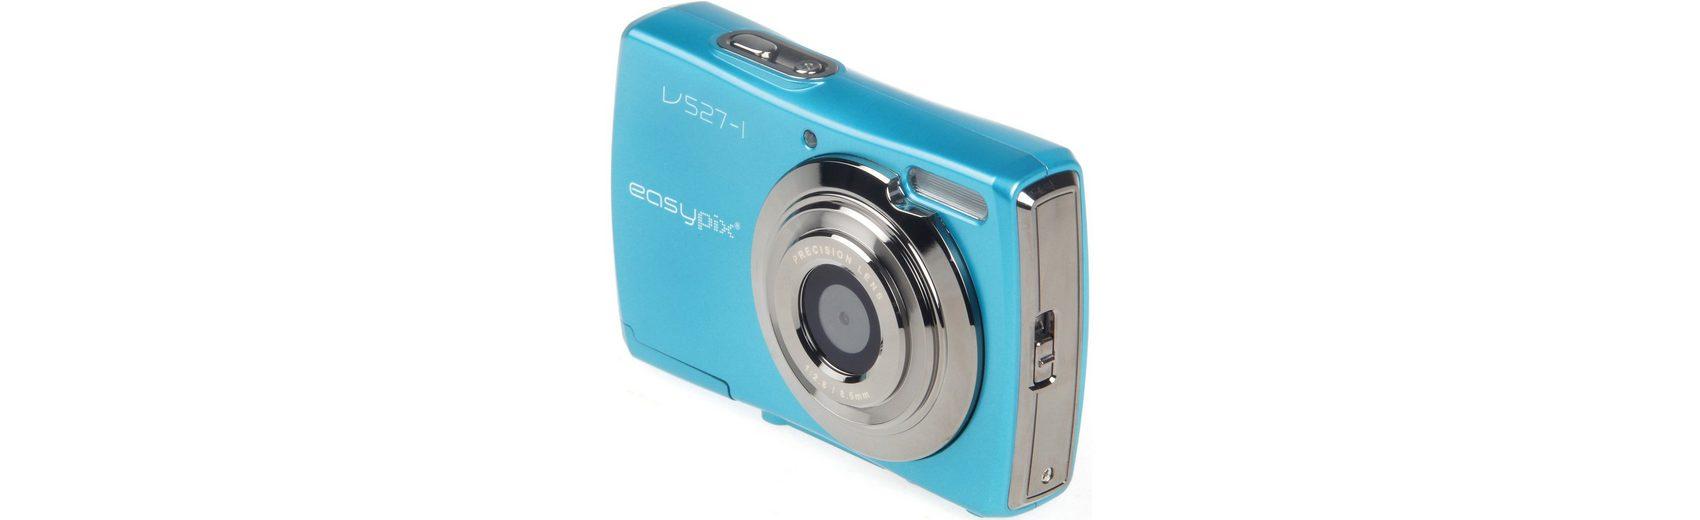 "Easypix Digitalkamera V527-I ""Candy"" eisblau"